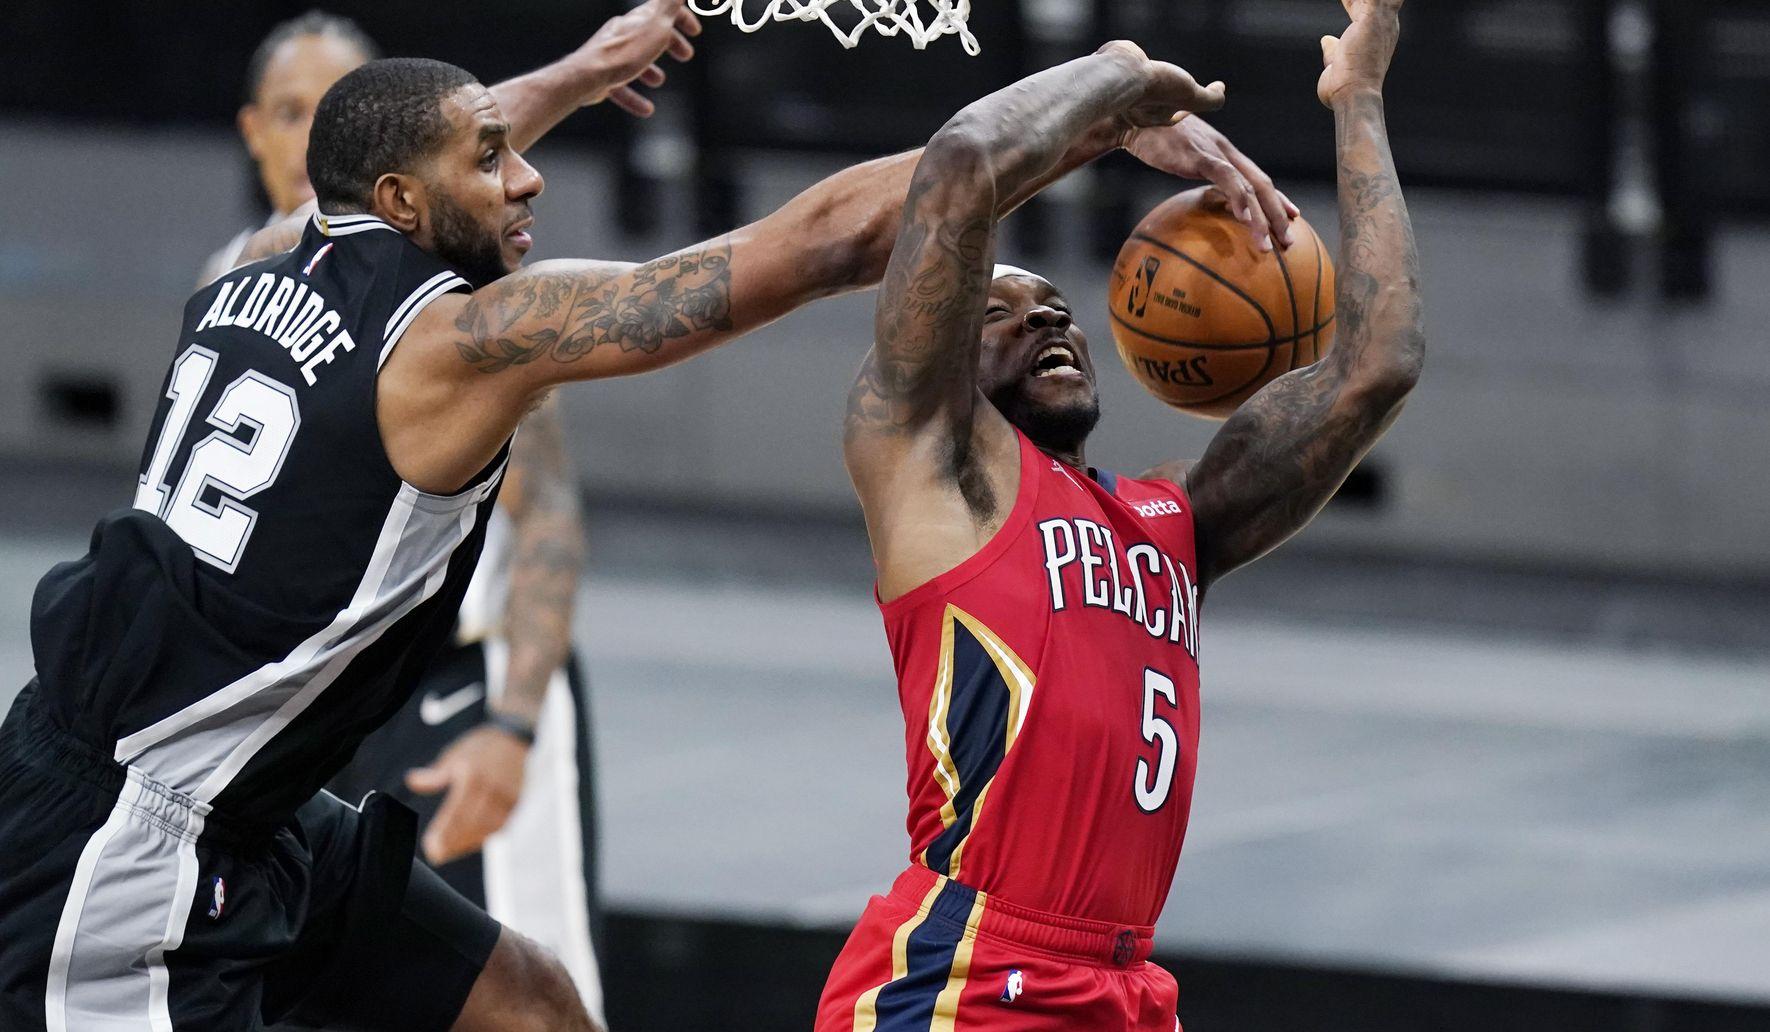 Pelicans_spurs_basketball_10169_c0-201-4797-2997_s1770x1032